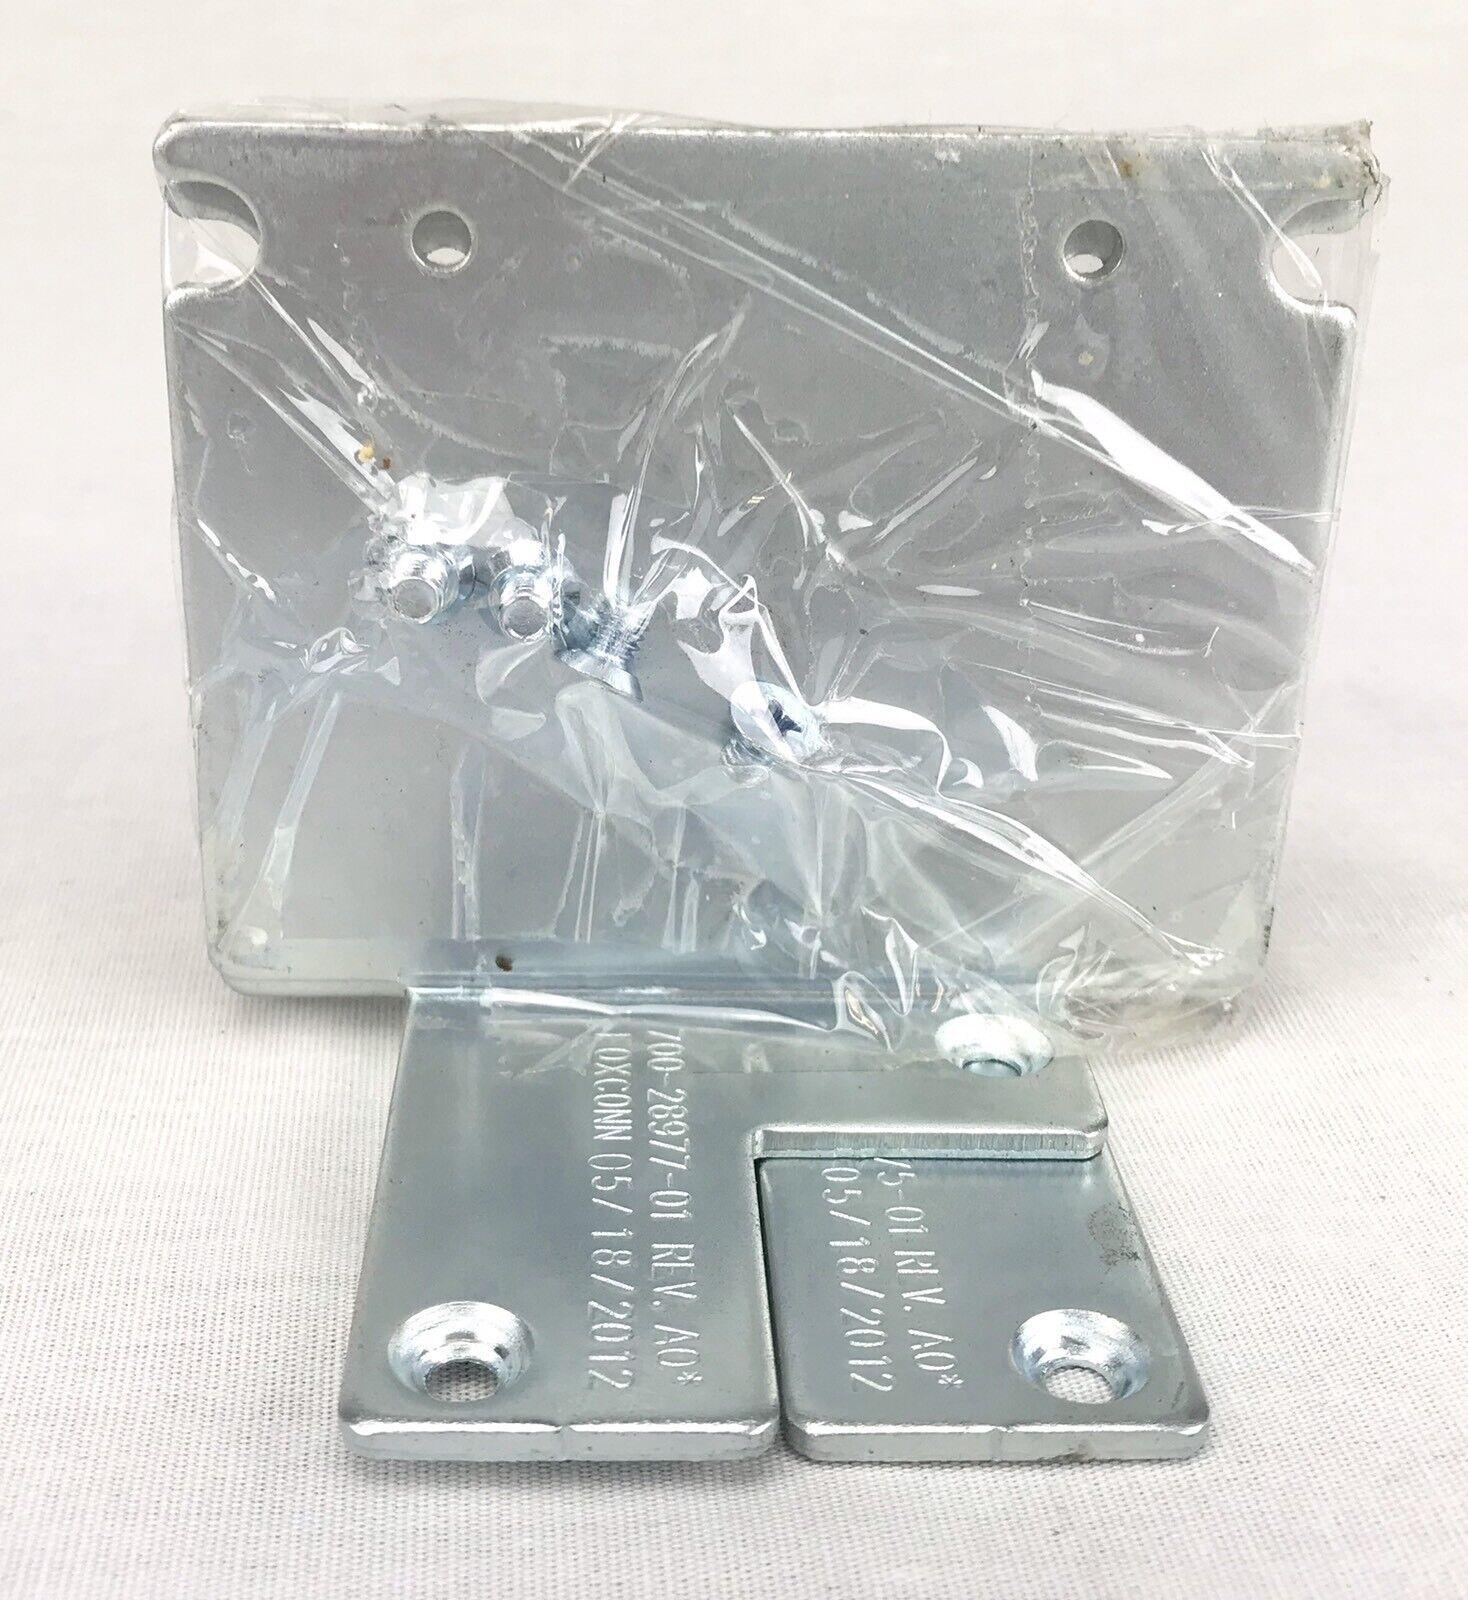 New* FoxConn 700-32843-01 2U Rack Mount Ears Bracket Kit with Screws